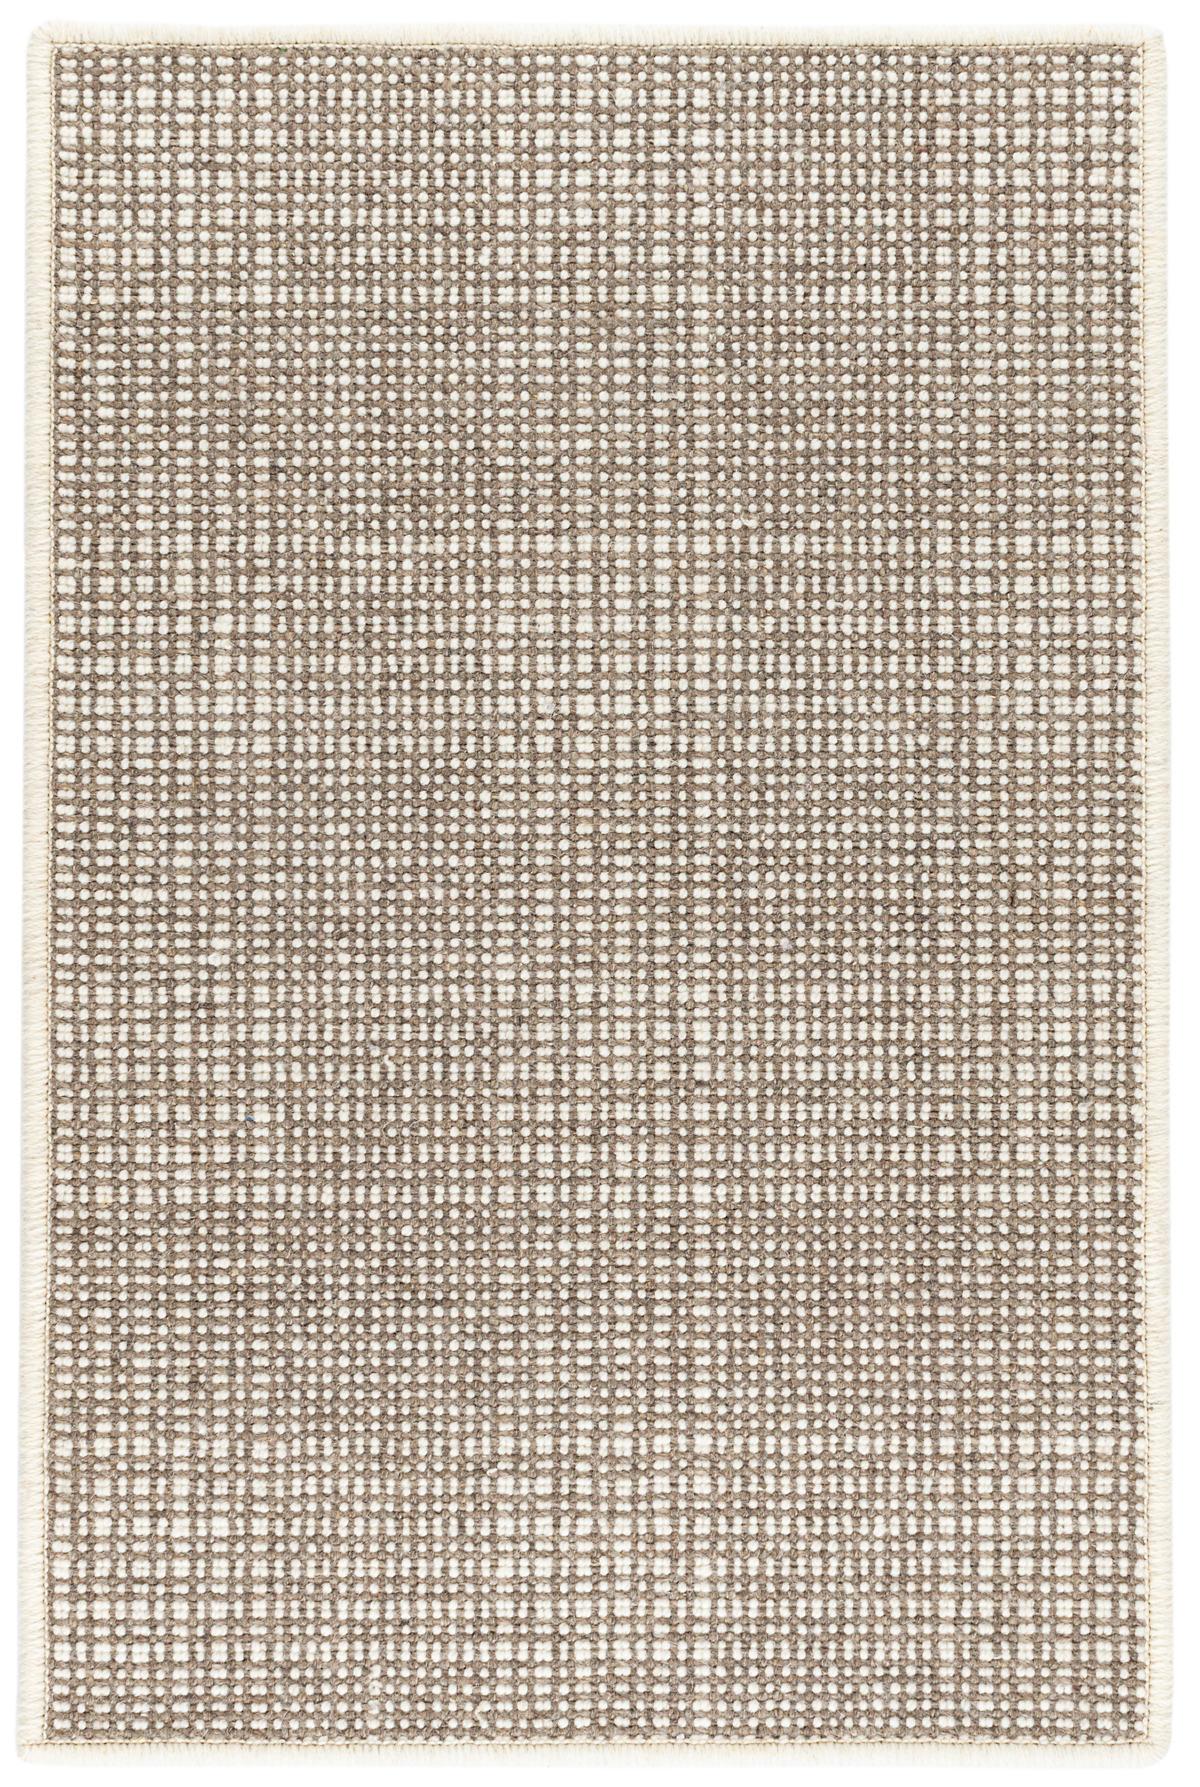 Checkers Flint Woven Wool Rug